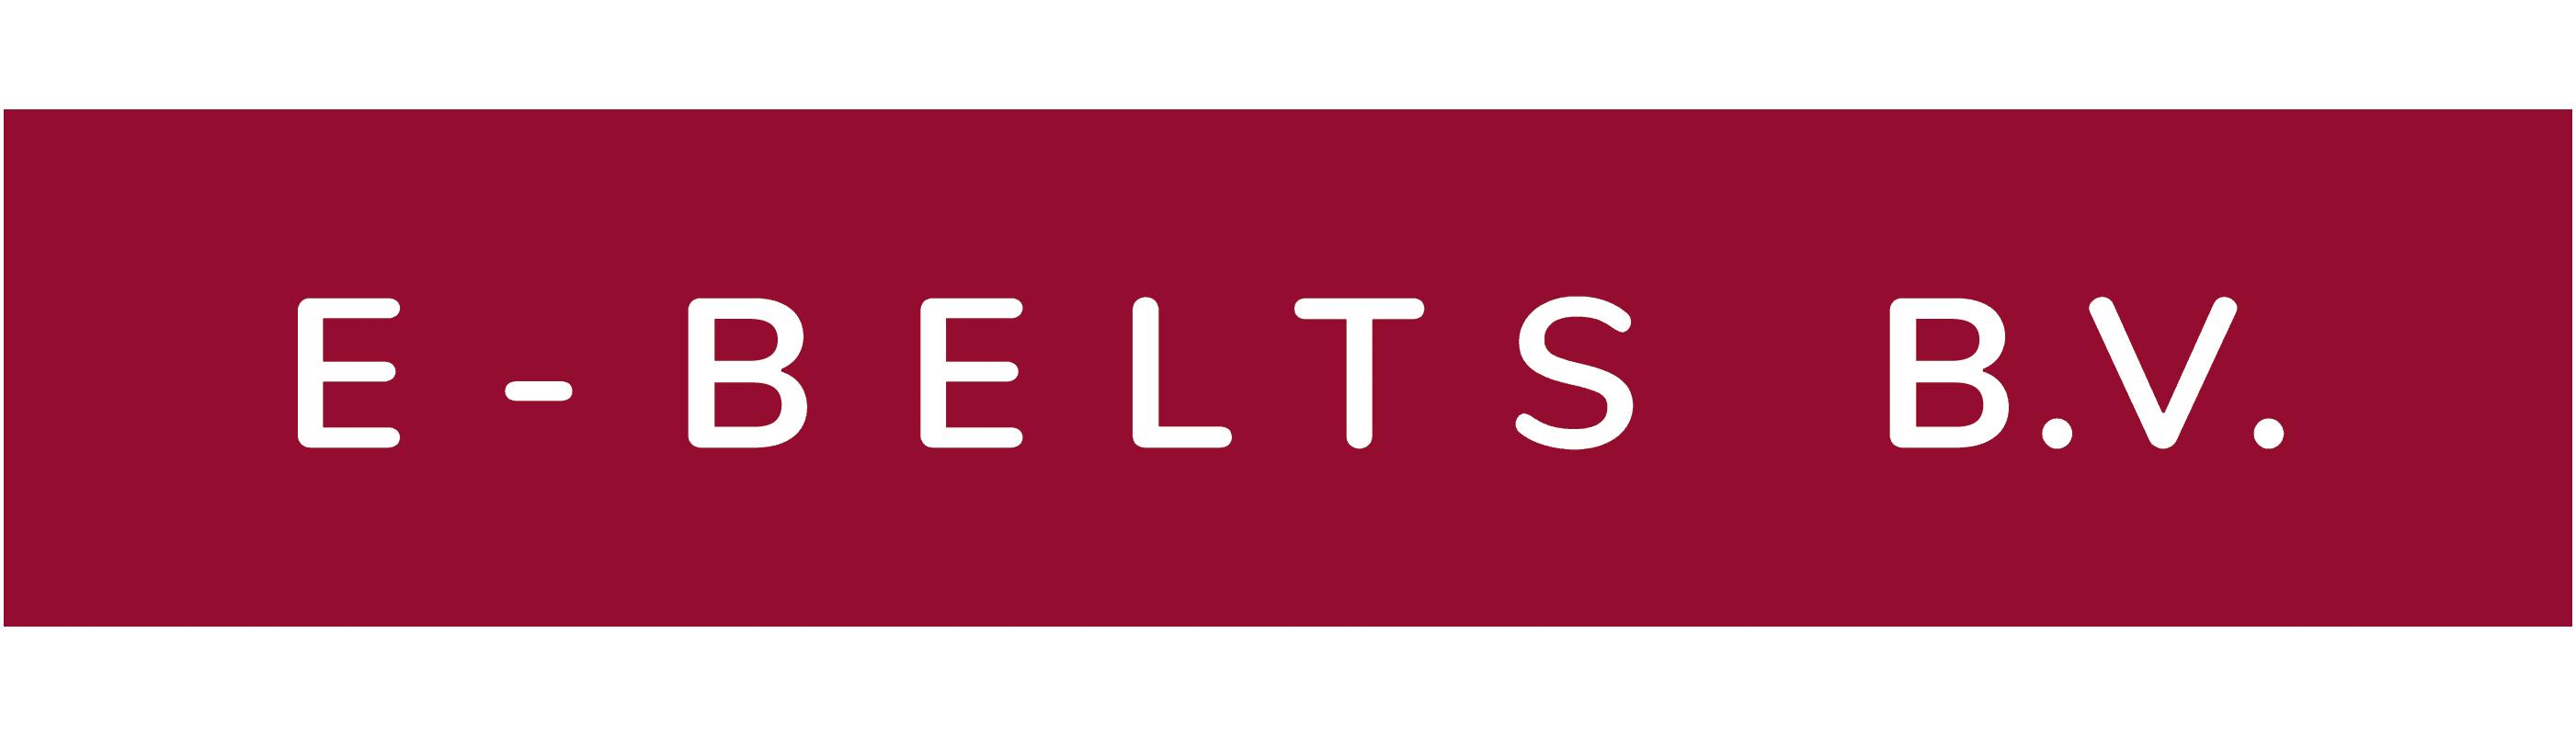 E-belts